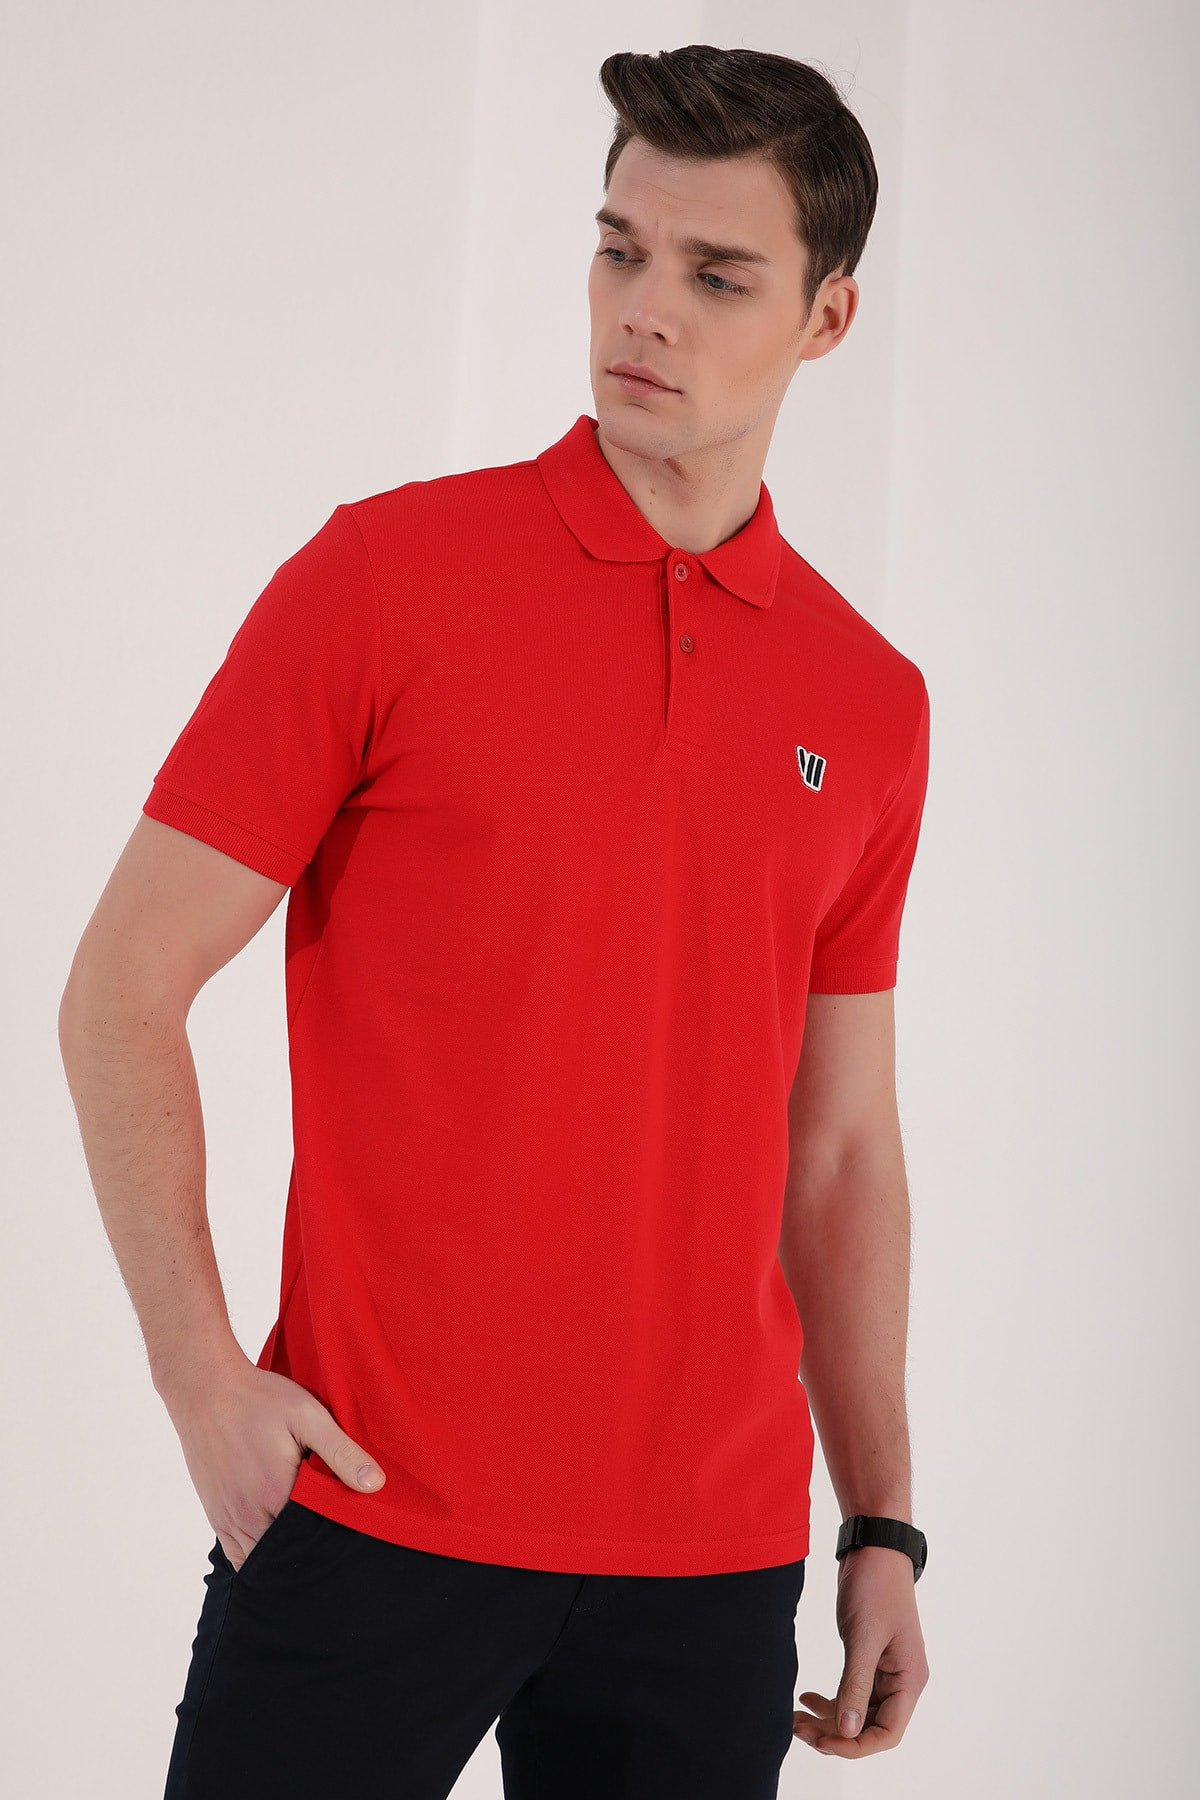 Tommy Life Klasik Polo Yaka Kırmızı Erkek Tshirt T08ER-87768 2